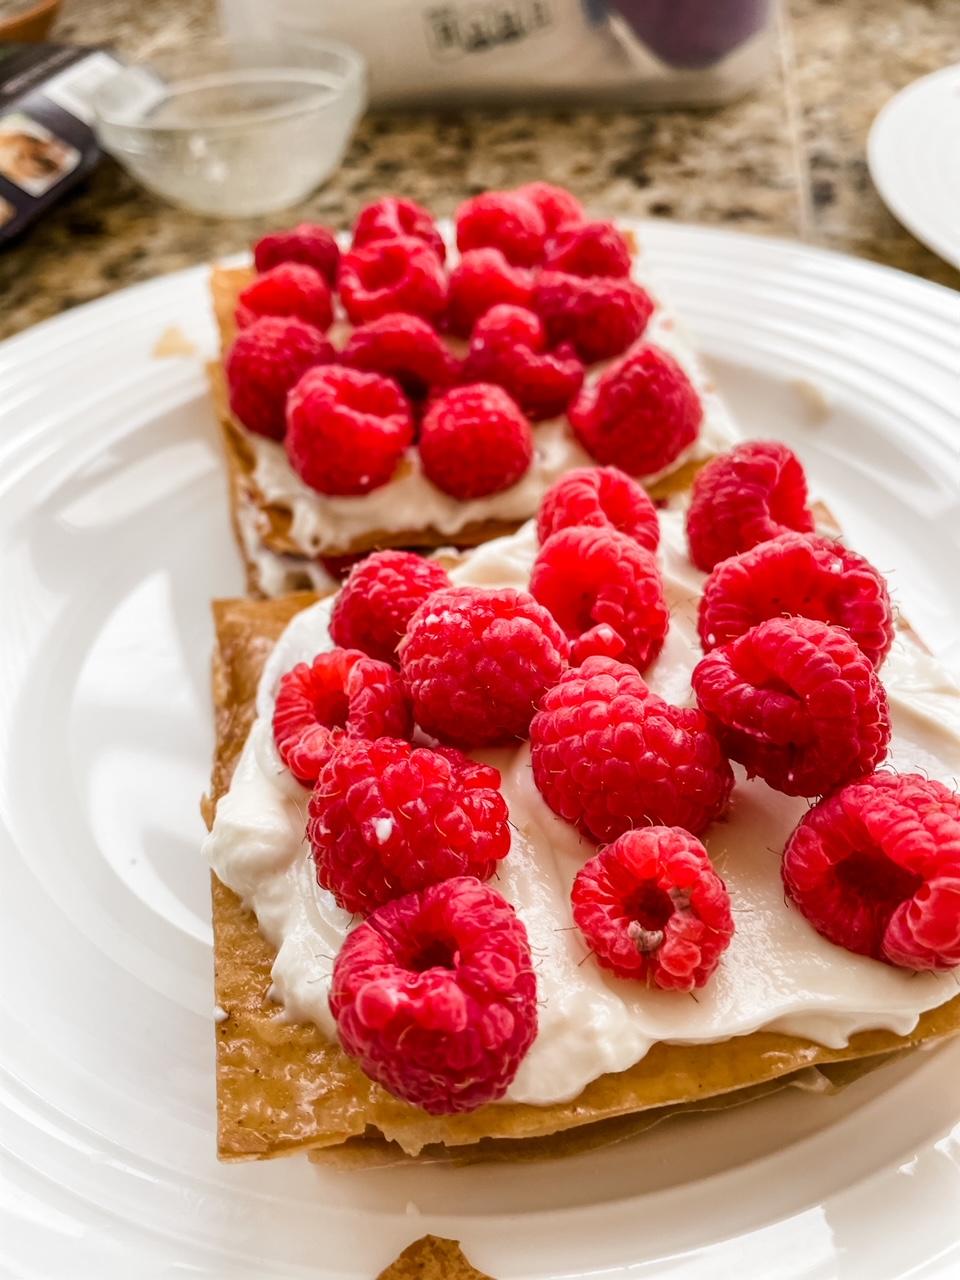 The pastries layered with yogurt and raspberries